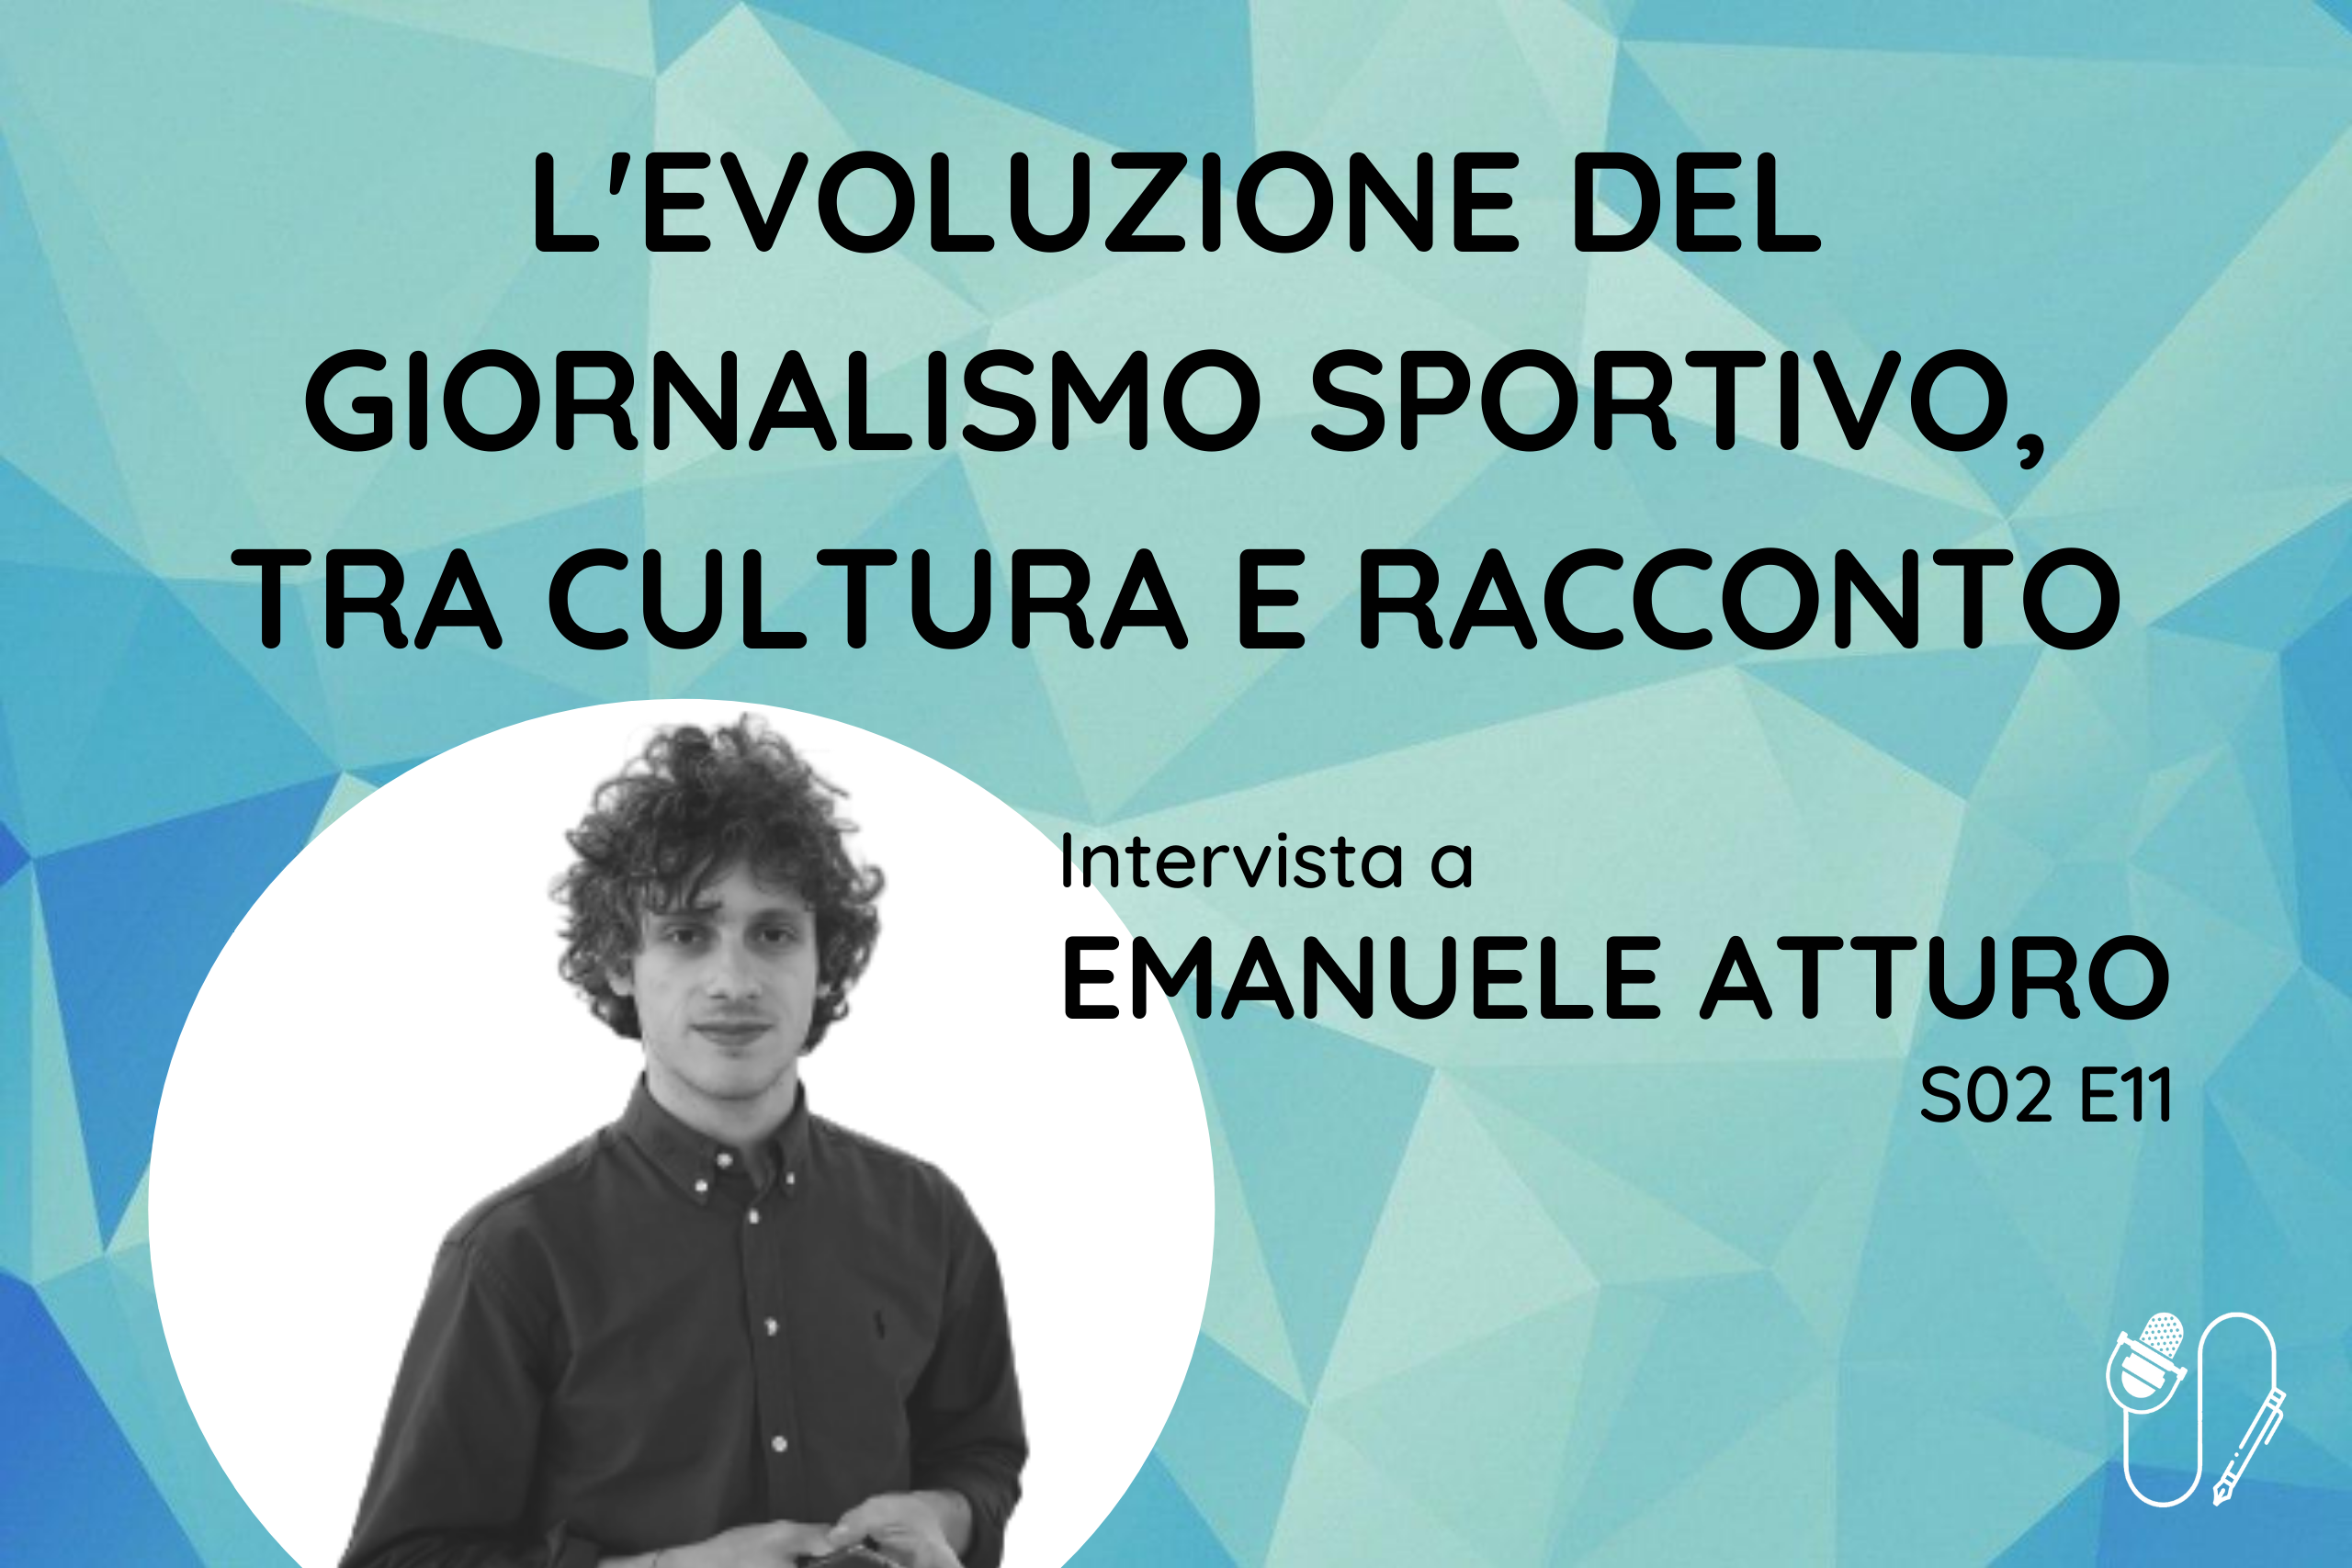 Emanuele Atturo